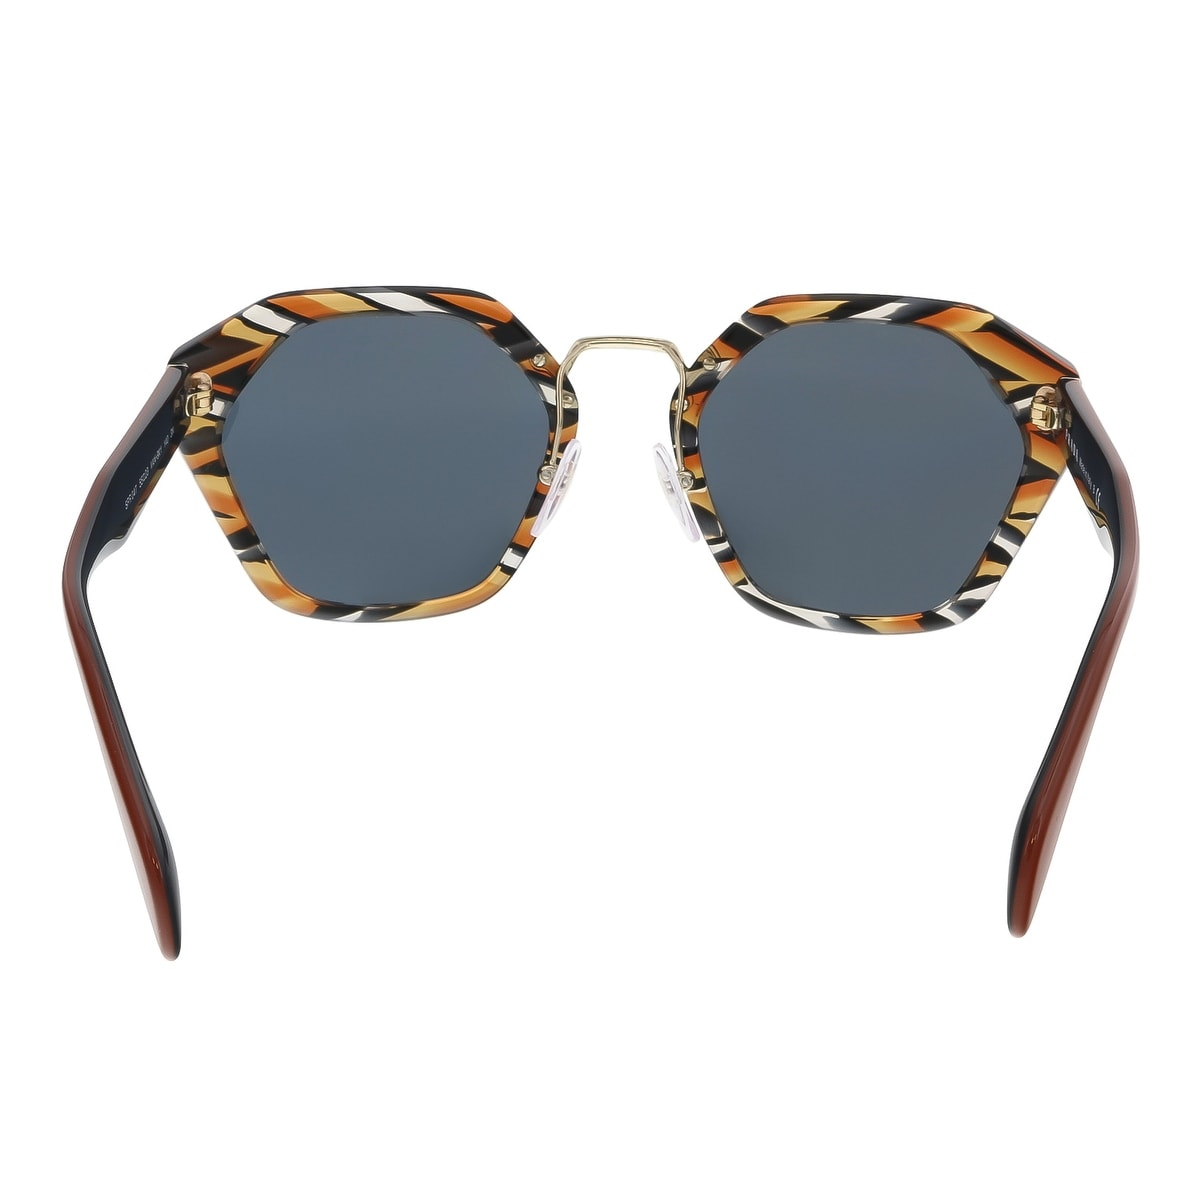 3db5b46187b Shop Prada PR 04TS VAN9K1 Sheaves Grey Orange Square Sunglasses - Multi -  55-23-140 - Free Shipping Today - Overstock - 15326290